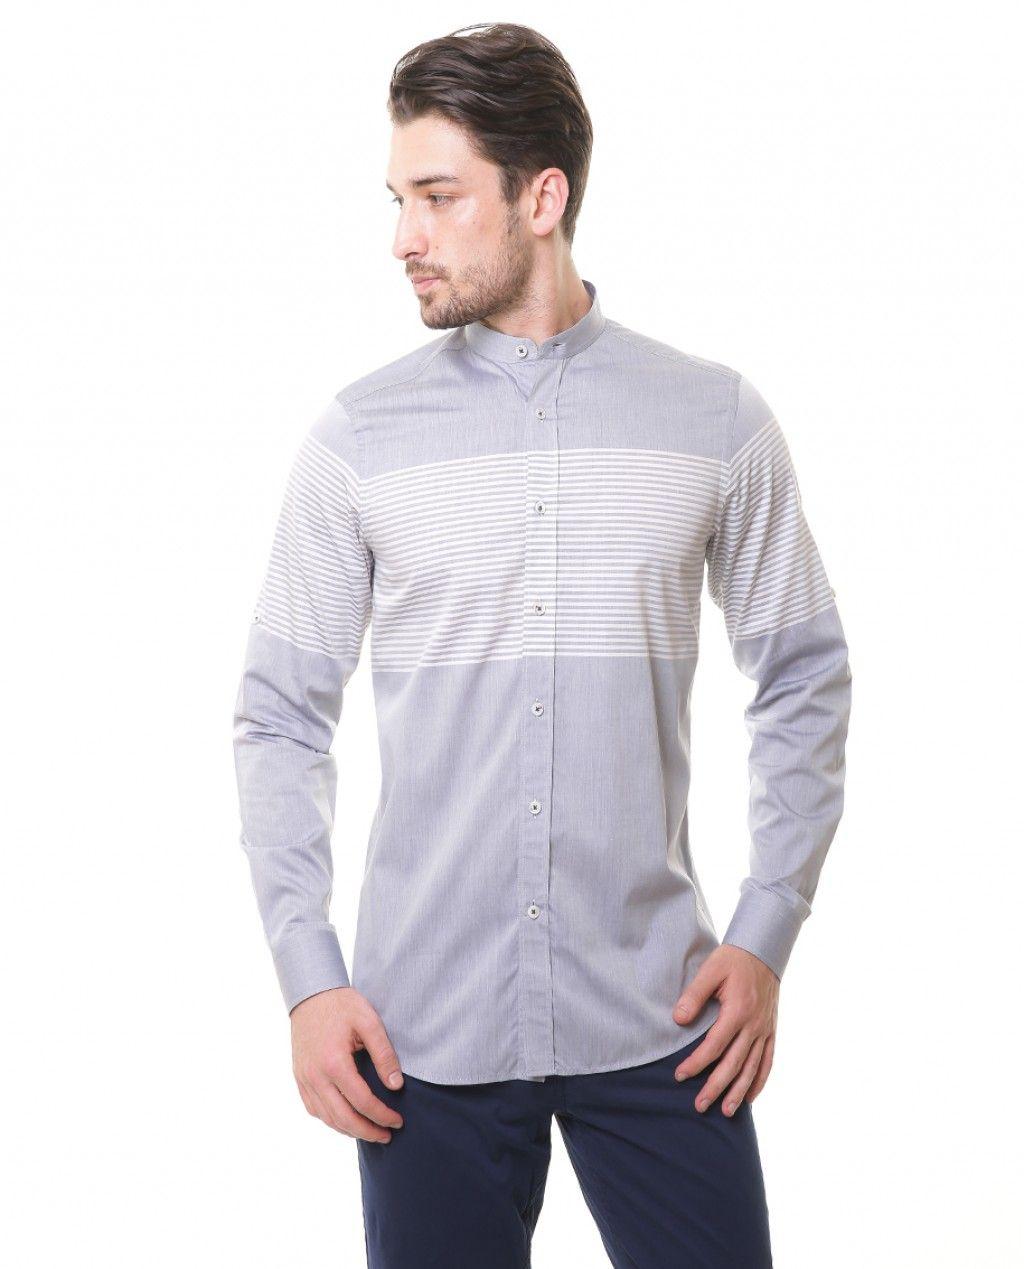 9052a4ffc79ff Karaca Erkek Gömlek - Lacivert #mensfashion #shirt #gomlek #karaca  #ciftgeyikkaraca www.karaca.com.tr